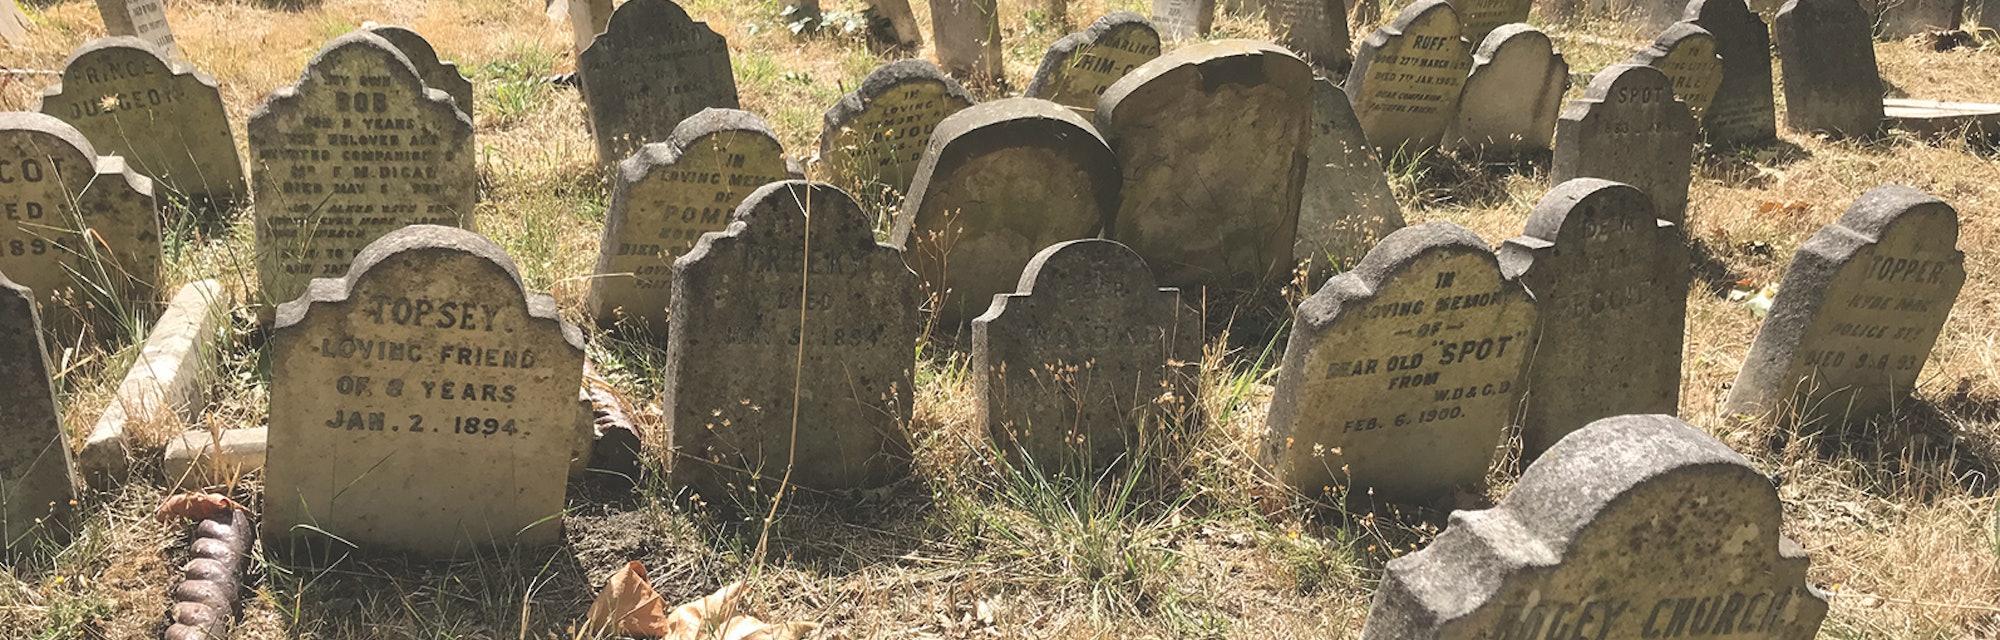 Britain's oldest pet cemetery